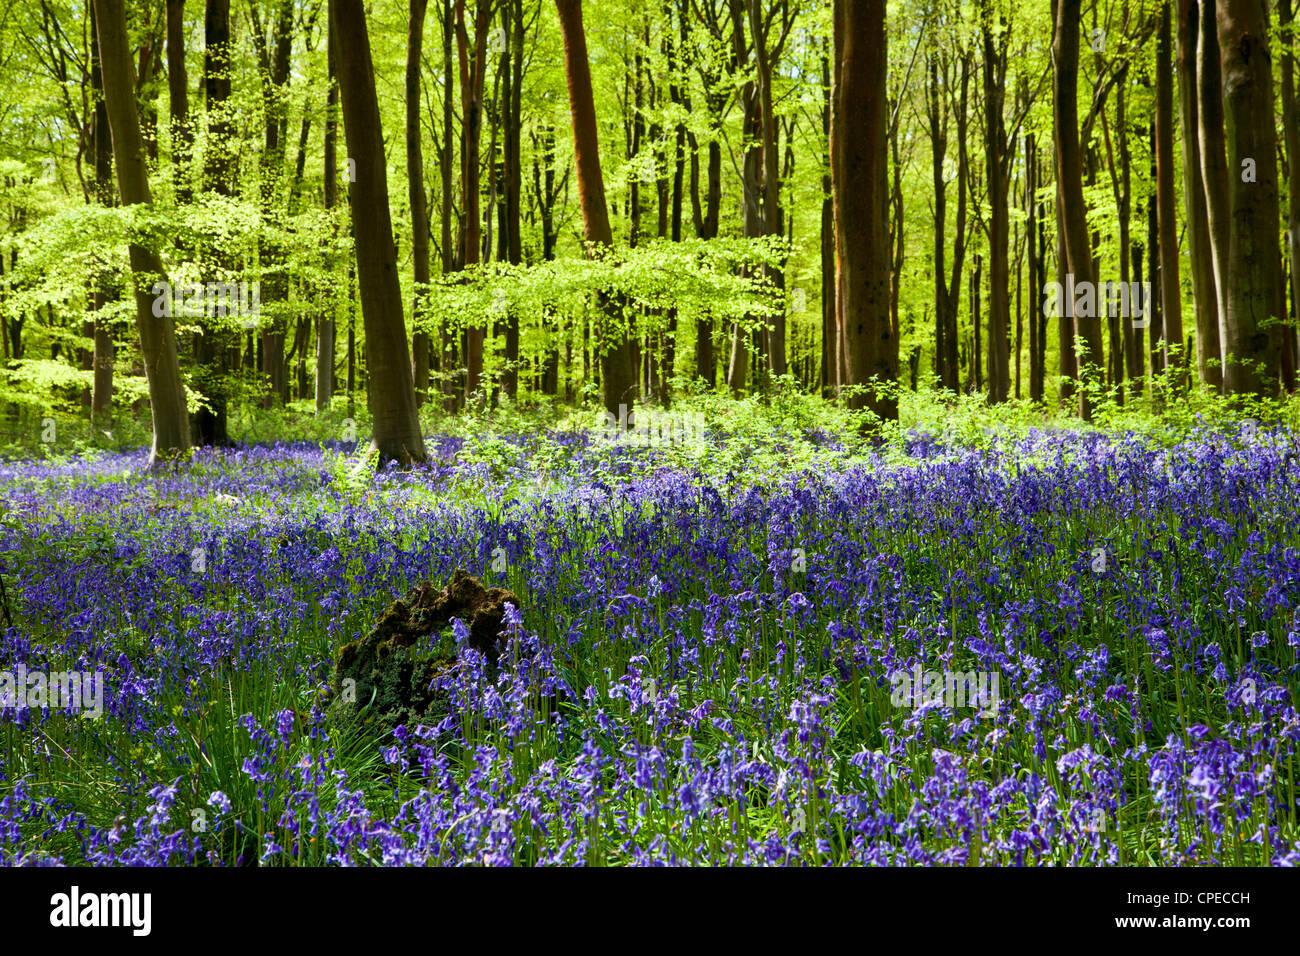 Dappled sunshine falls through fresh green foliage in a beechwood of bluebells in England, UK Stock Photo